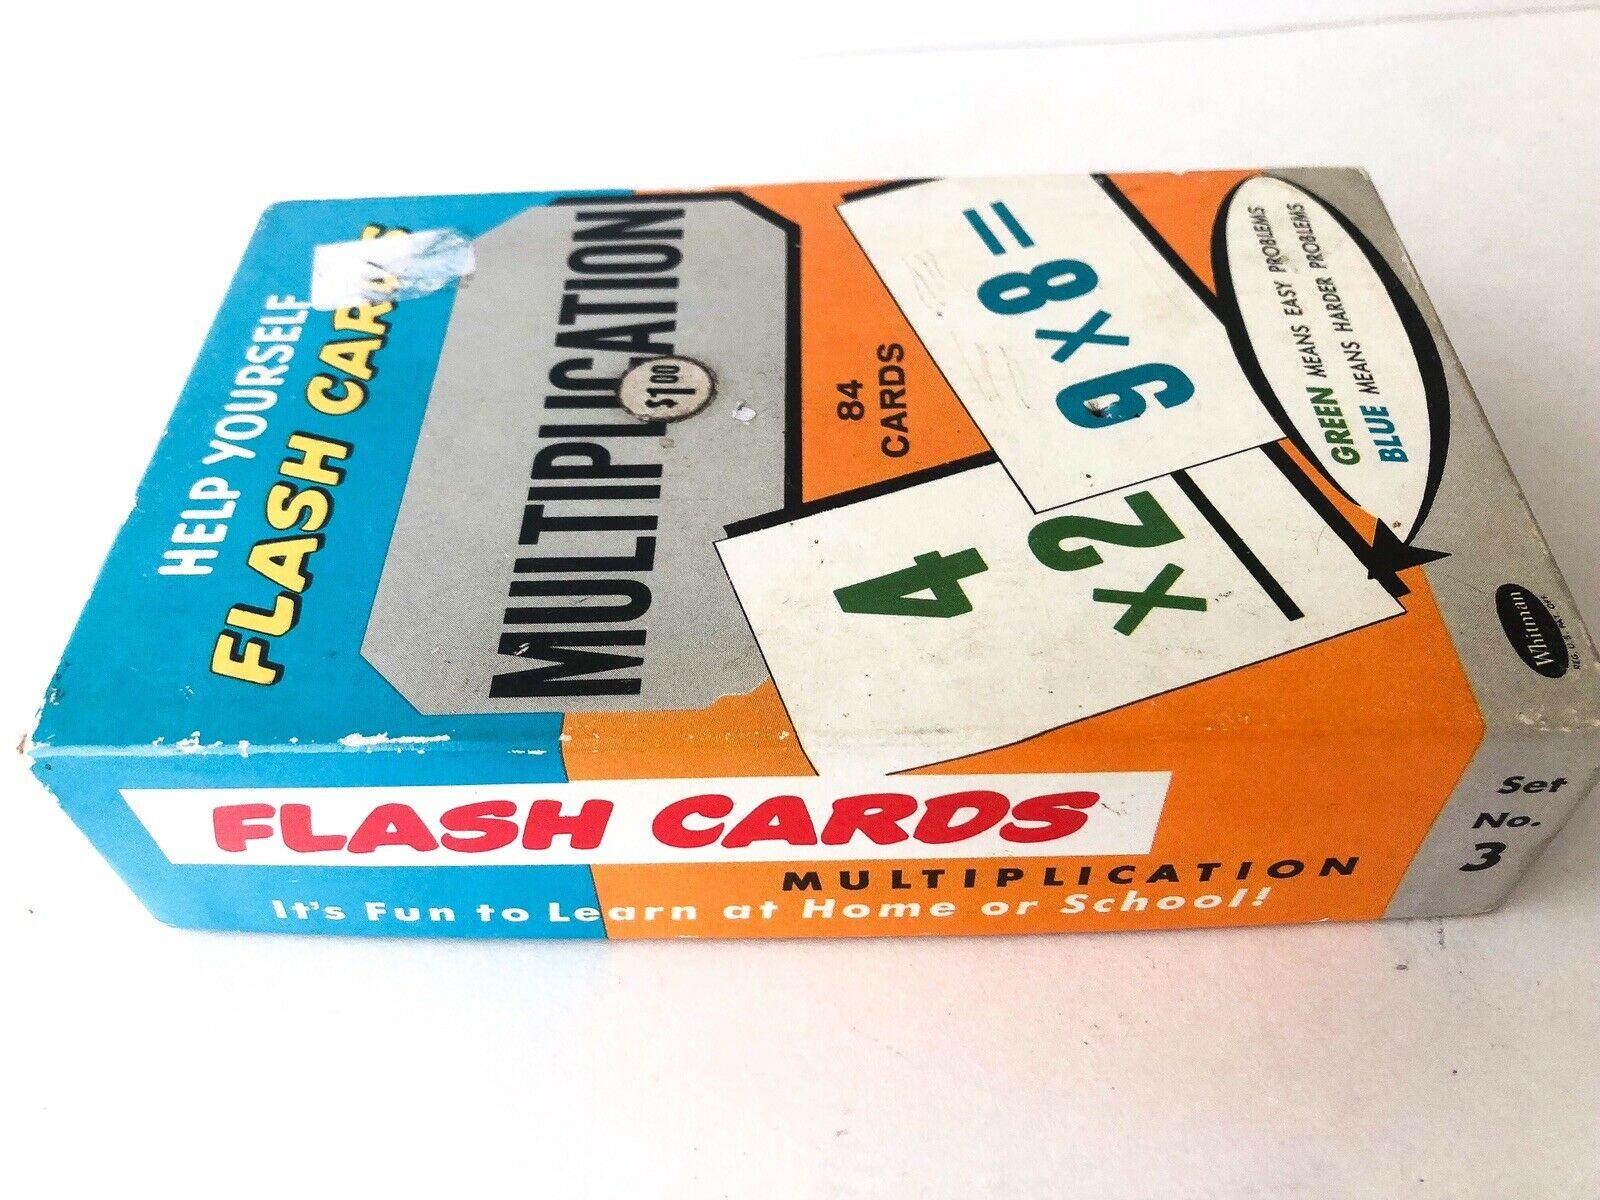 1959 Vintage Help Yourself Multiplication Flash Cardswhitman ~ No. 4743